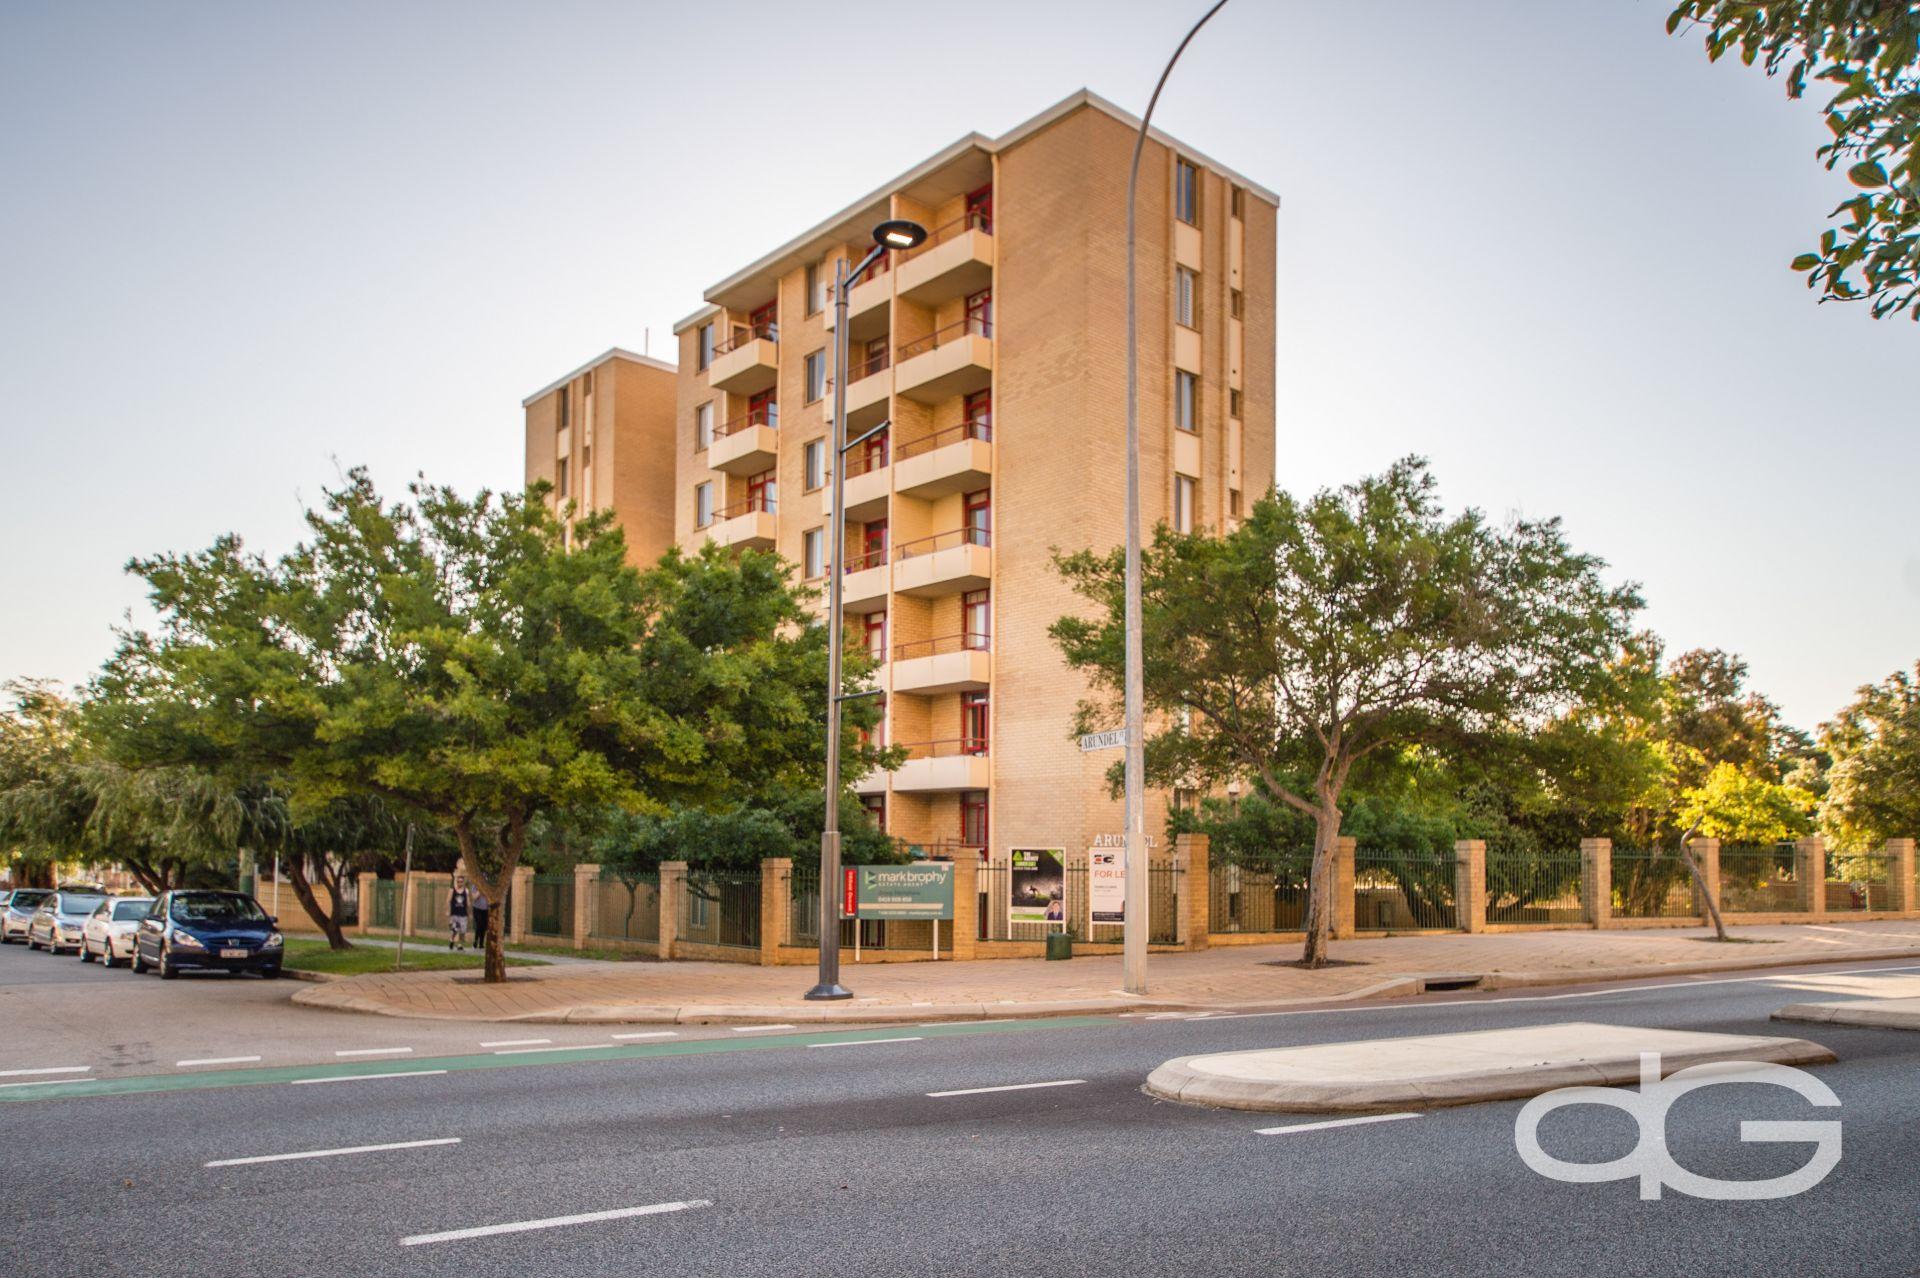 5/34 Arundel Street, Fremantle